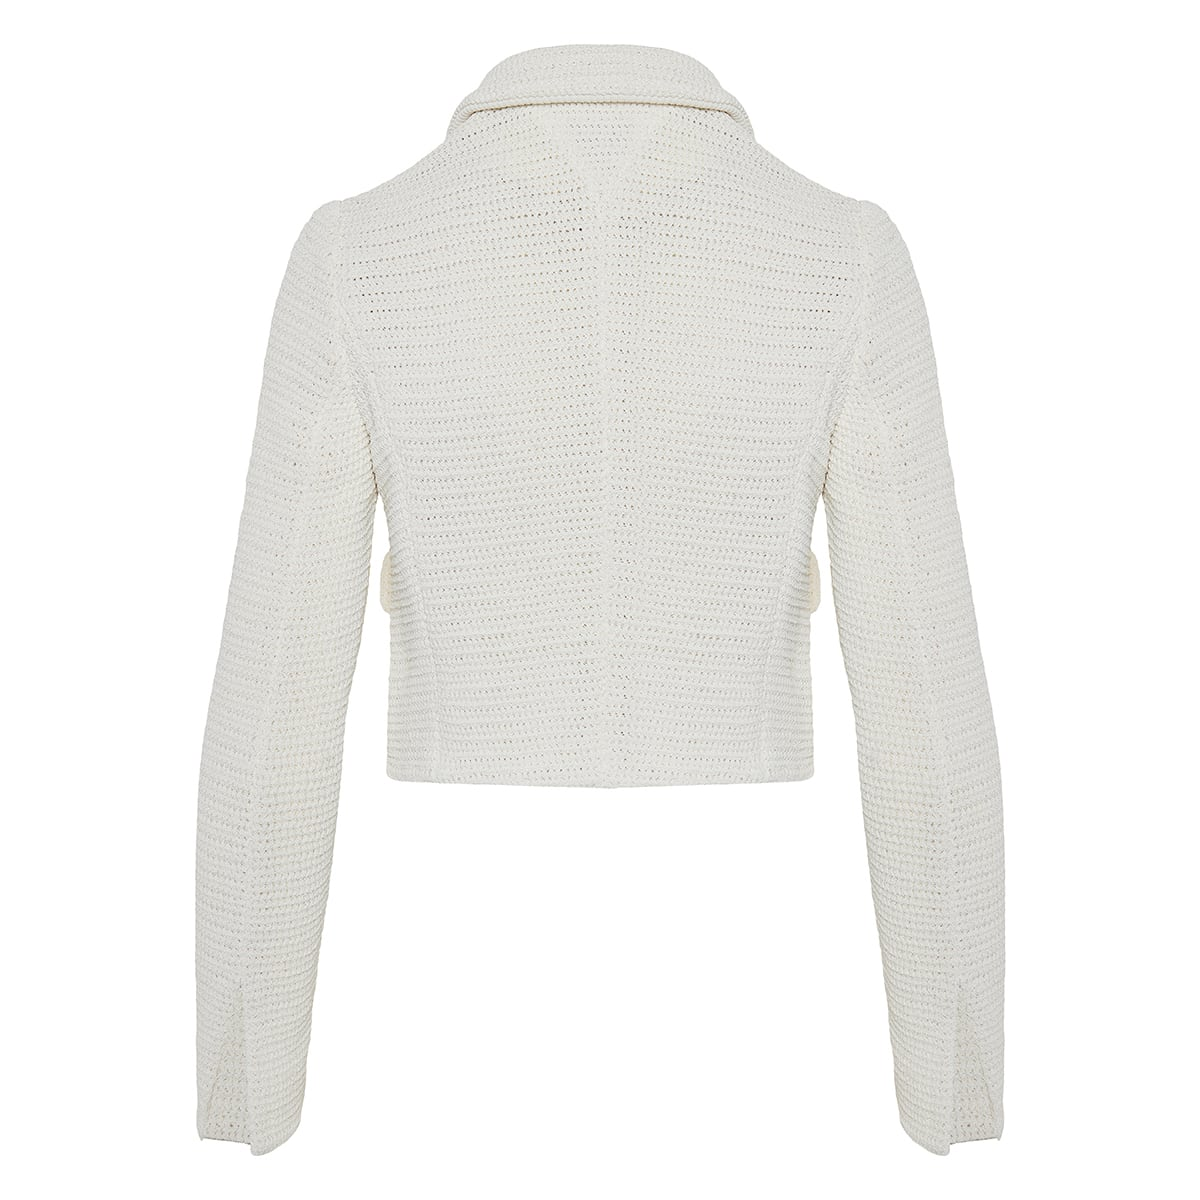 Mesh knit jacket